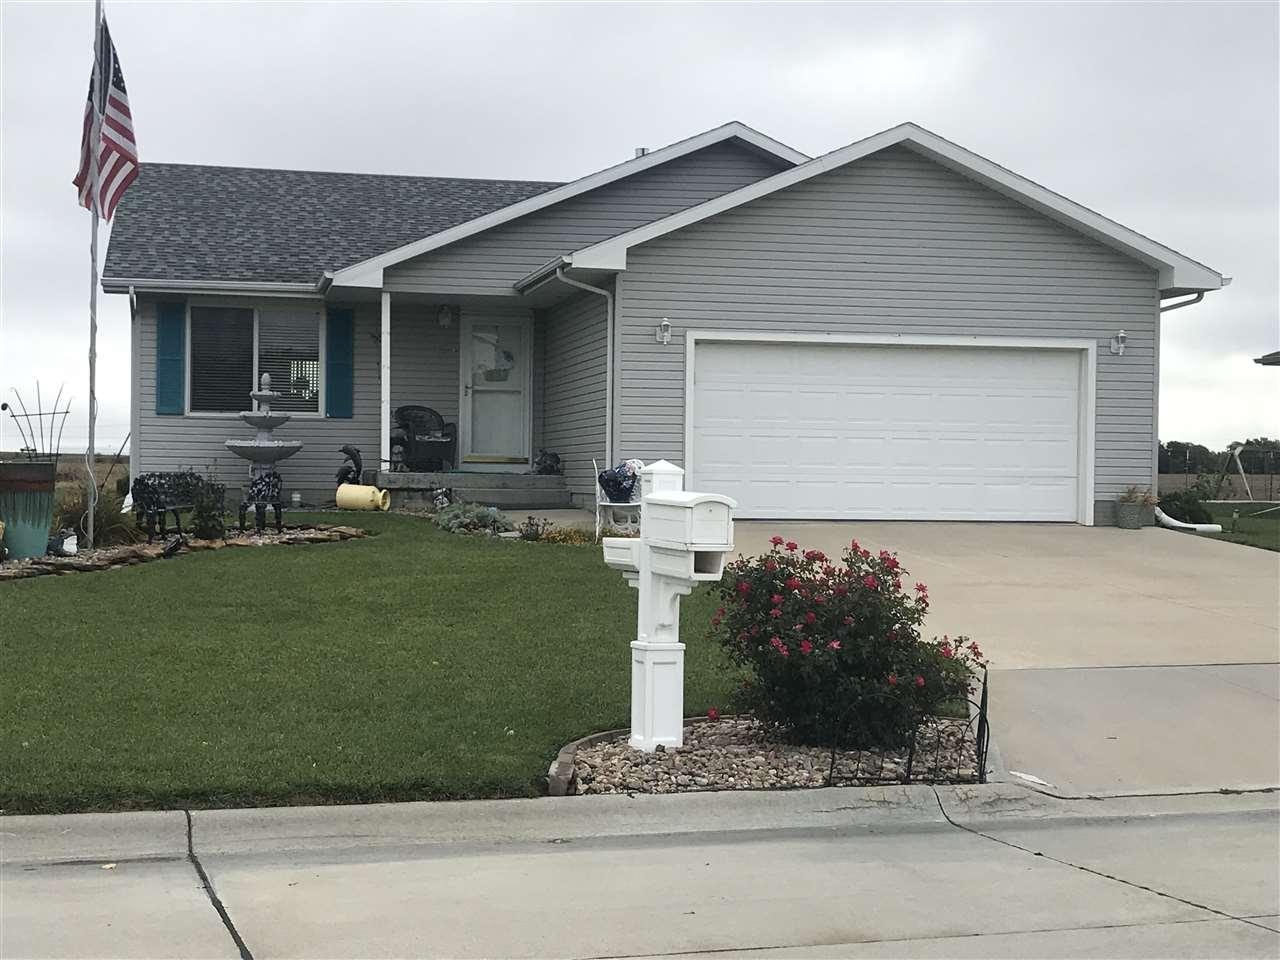 1306 7th Ave., Hastings, Nebraska